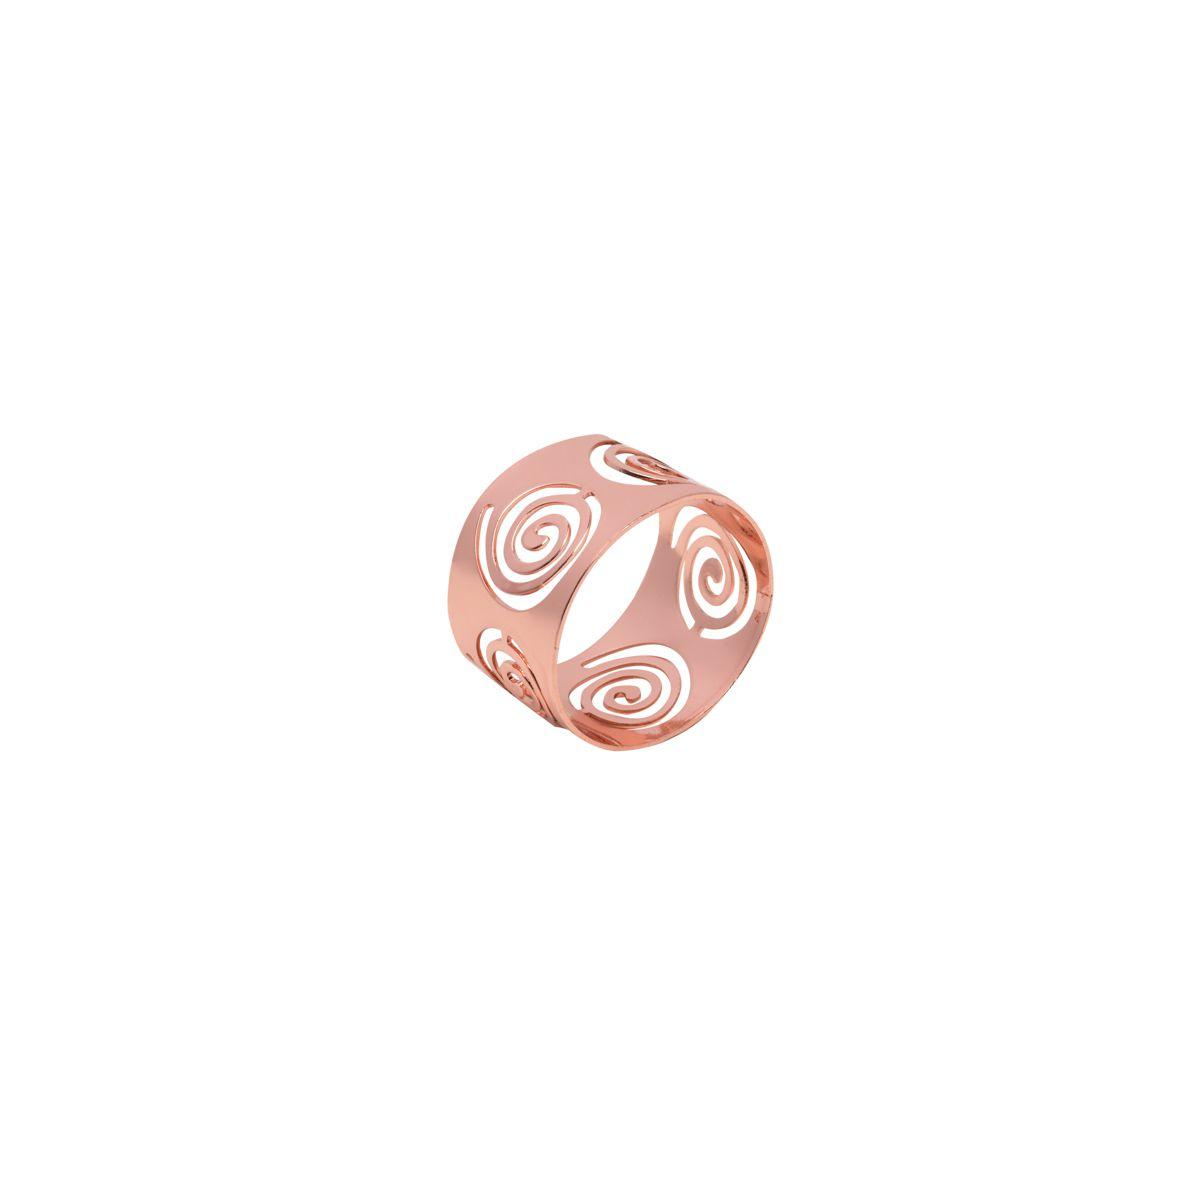 Jogo 4 anéis para guardanapo de aço inox rosé gold Circles Prestige - 26511